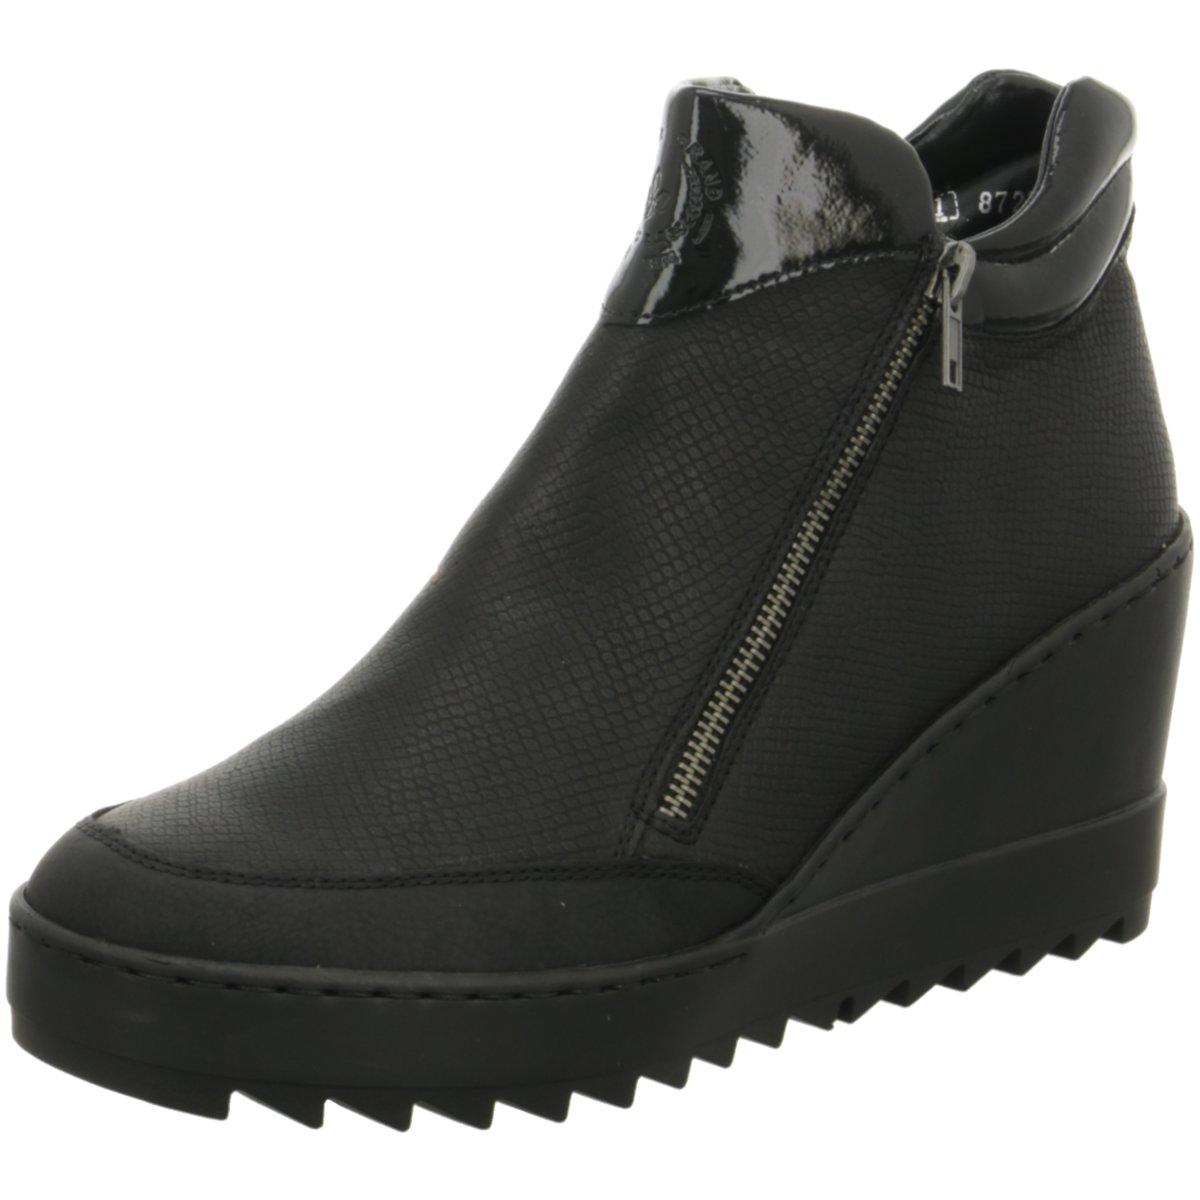 NEU Rieker Damen Stiefeletten N2992-00 schwarz 404304